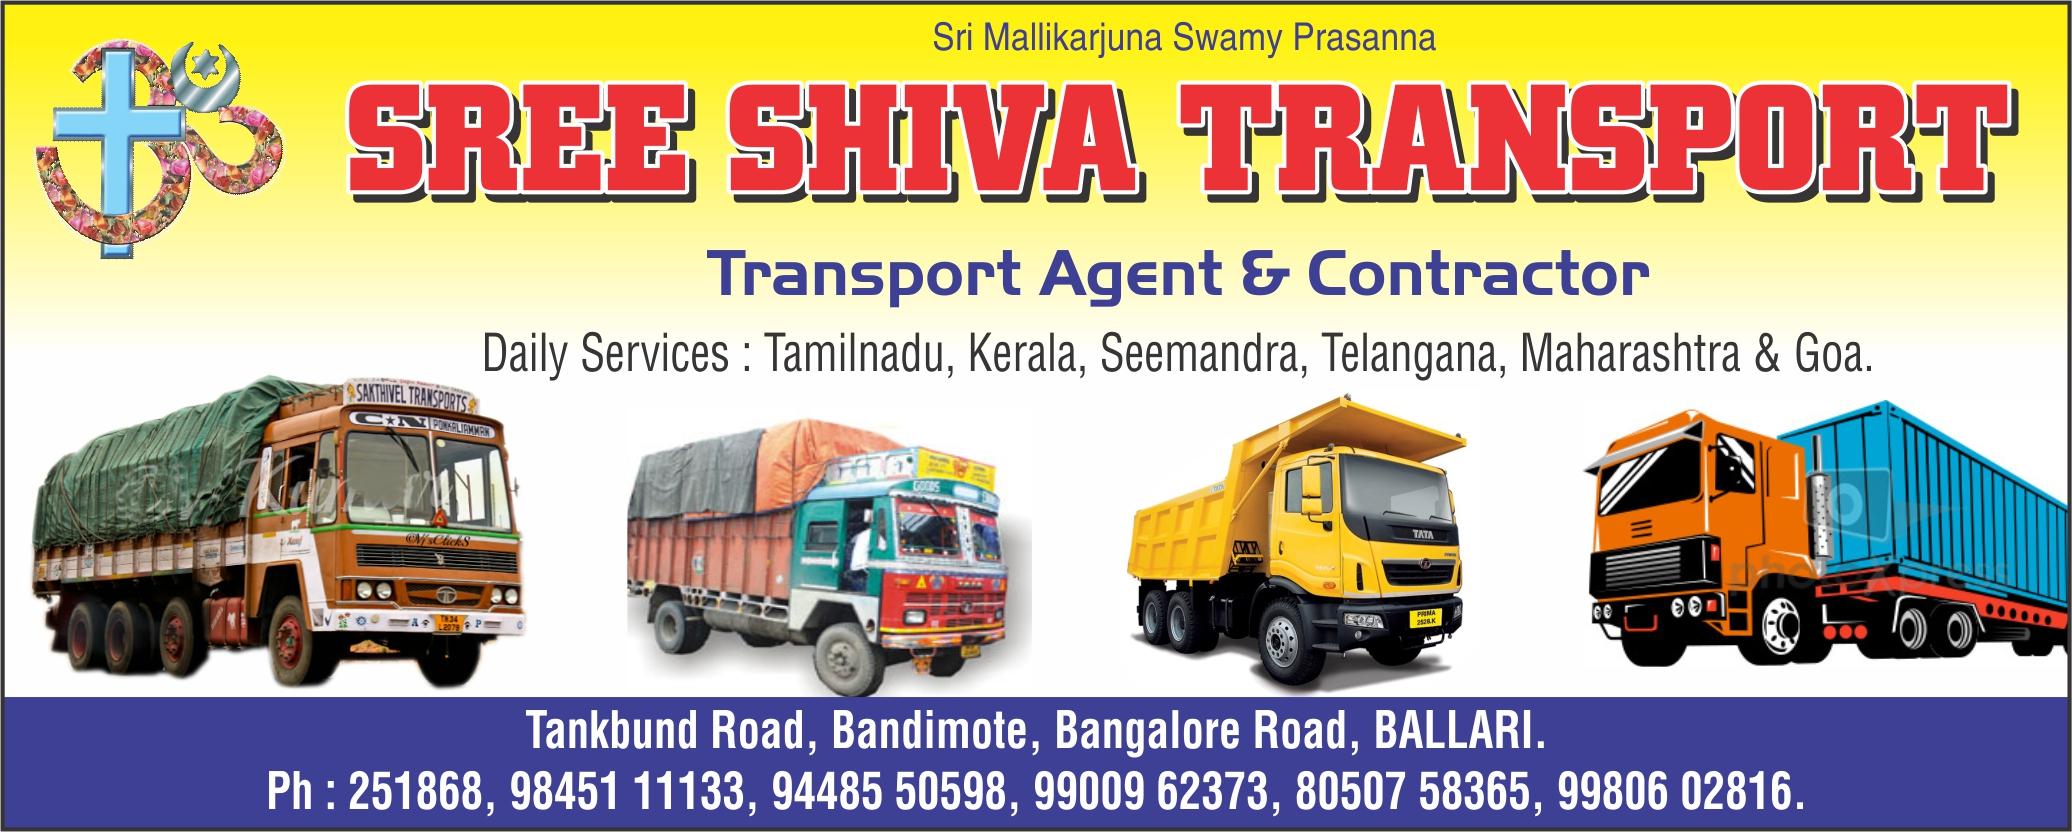 Sree Shiva Transport